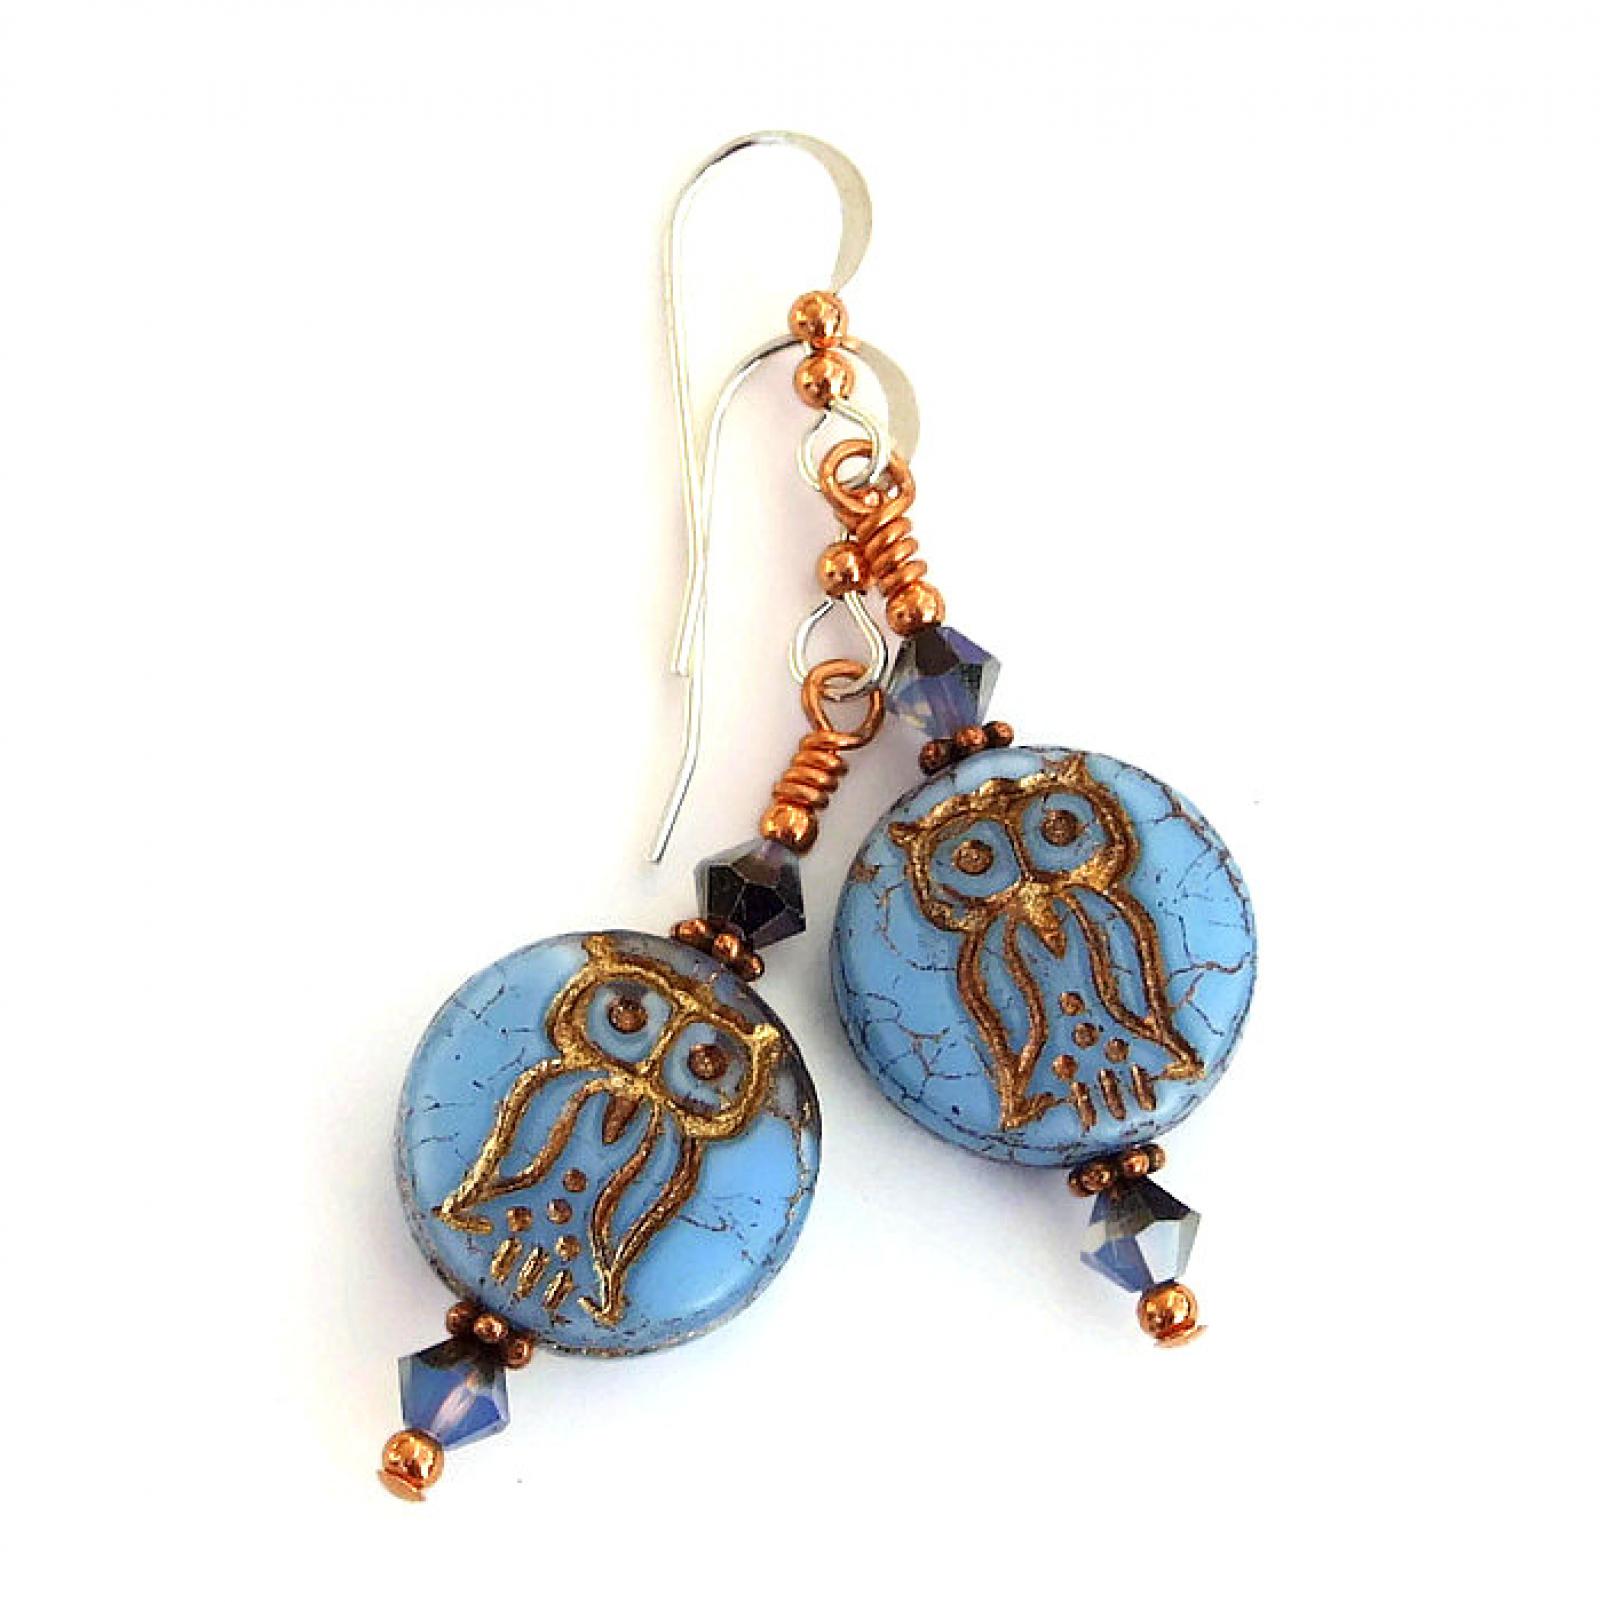 fc480330f ... jewelry; blue and copper owl earrings; handmade owl earrings for a bird  lover ...